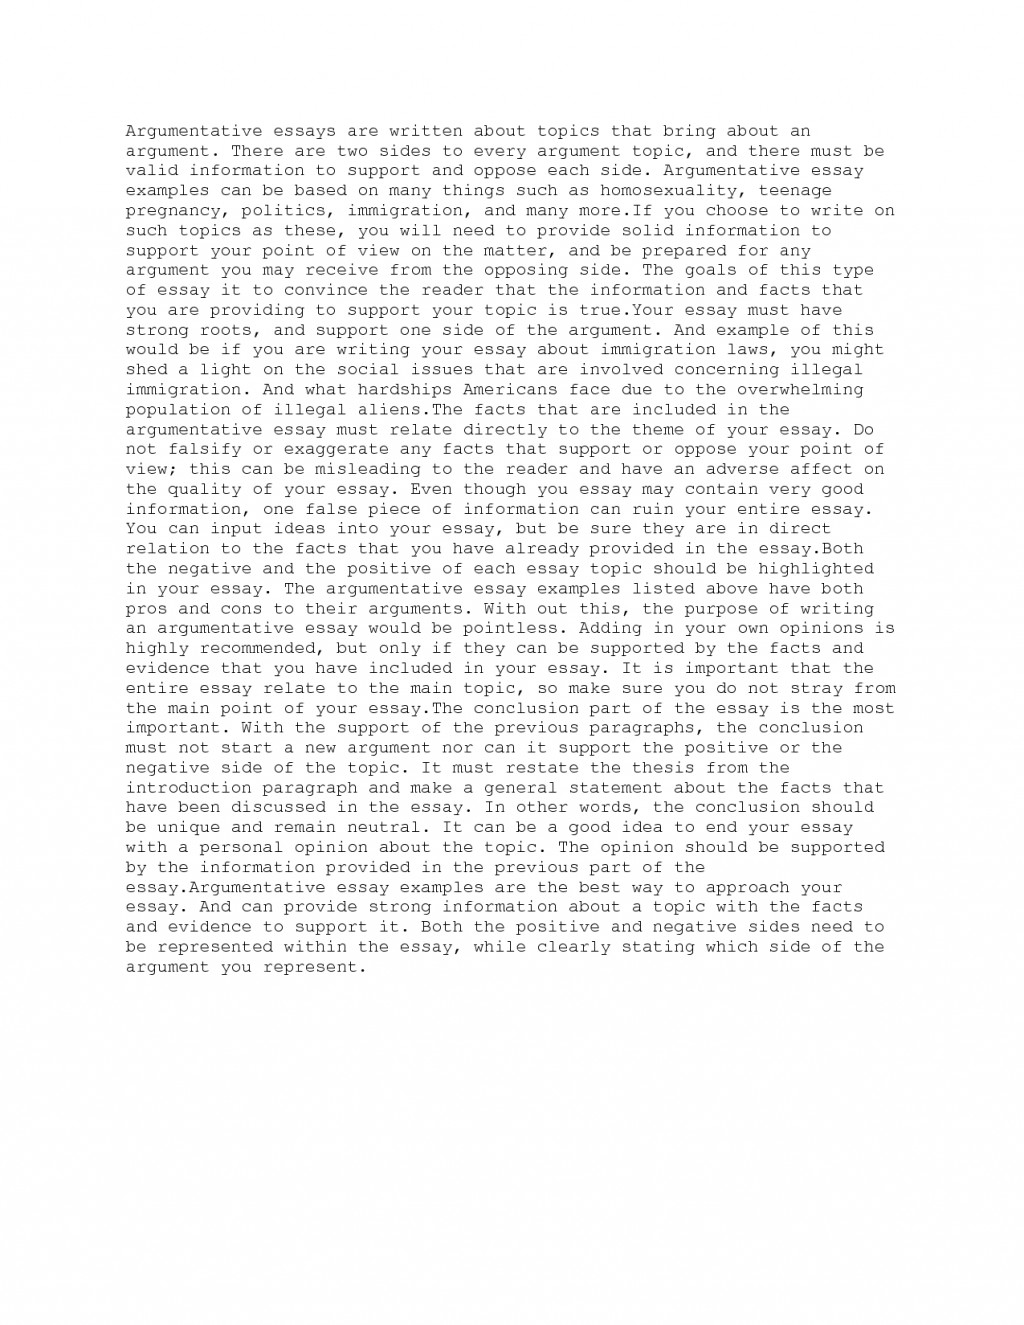 014 Qv3jjq5wkt Essay Example Good Topics For Wonderful A Discursive Interesting Higher Persuasive Large